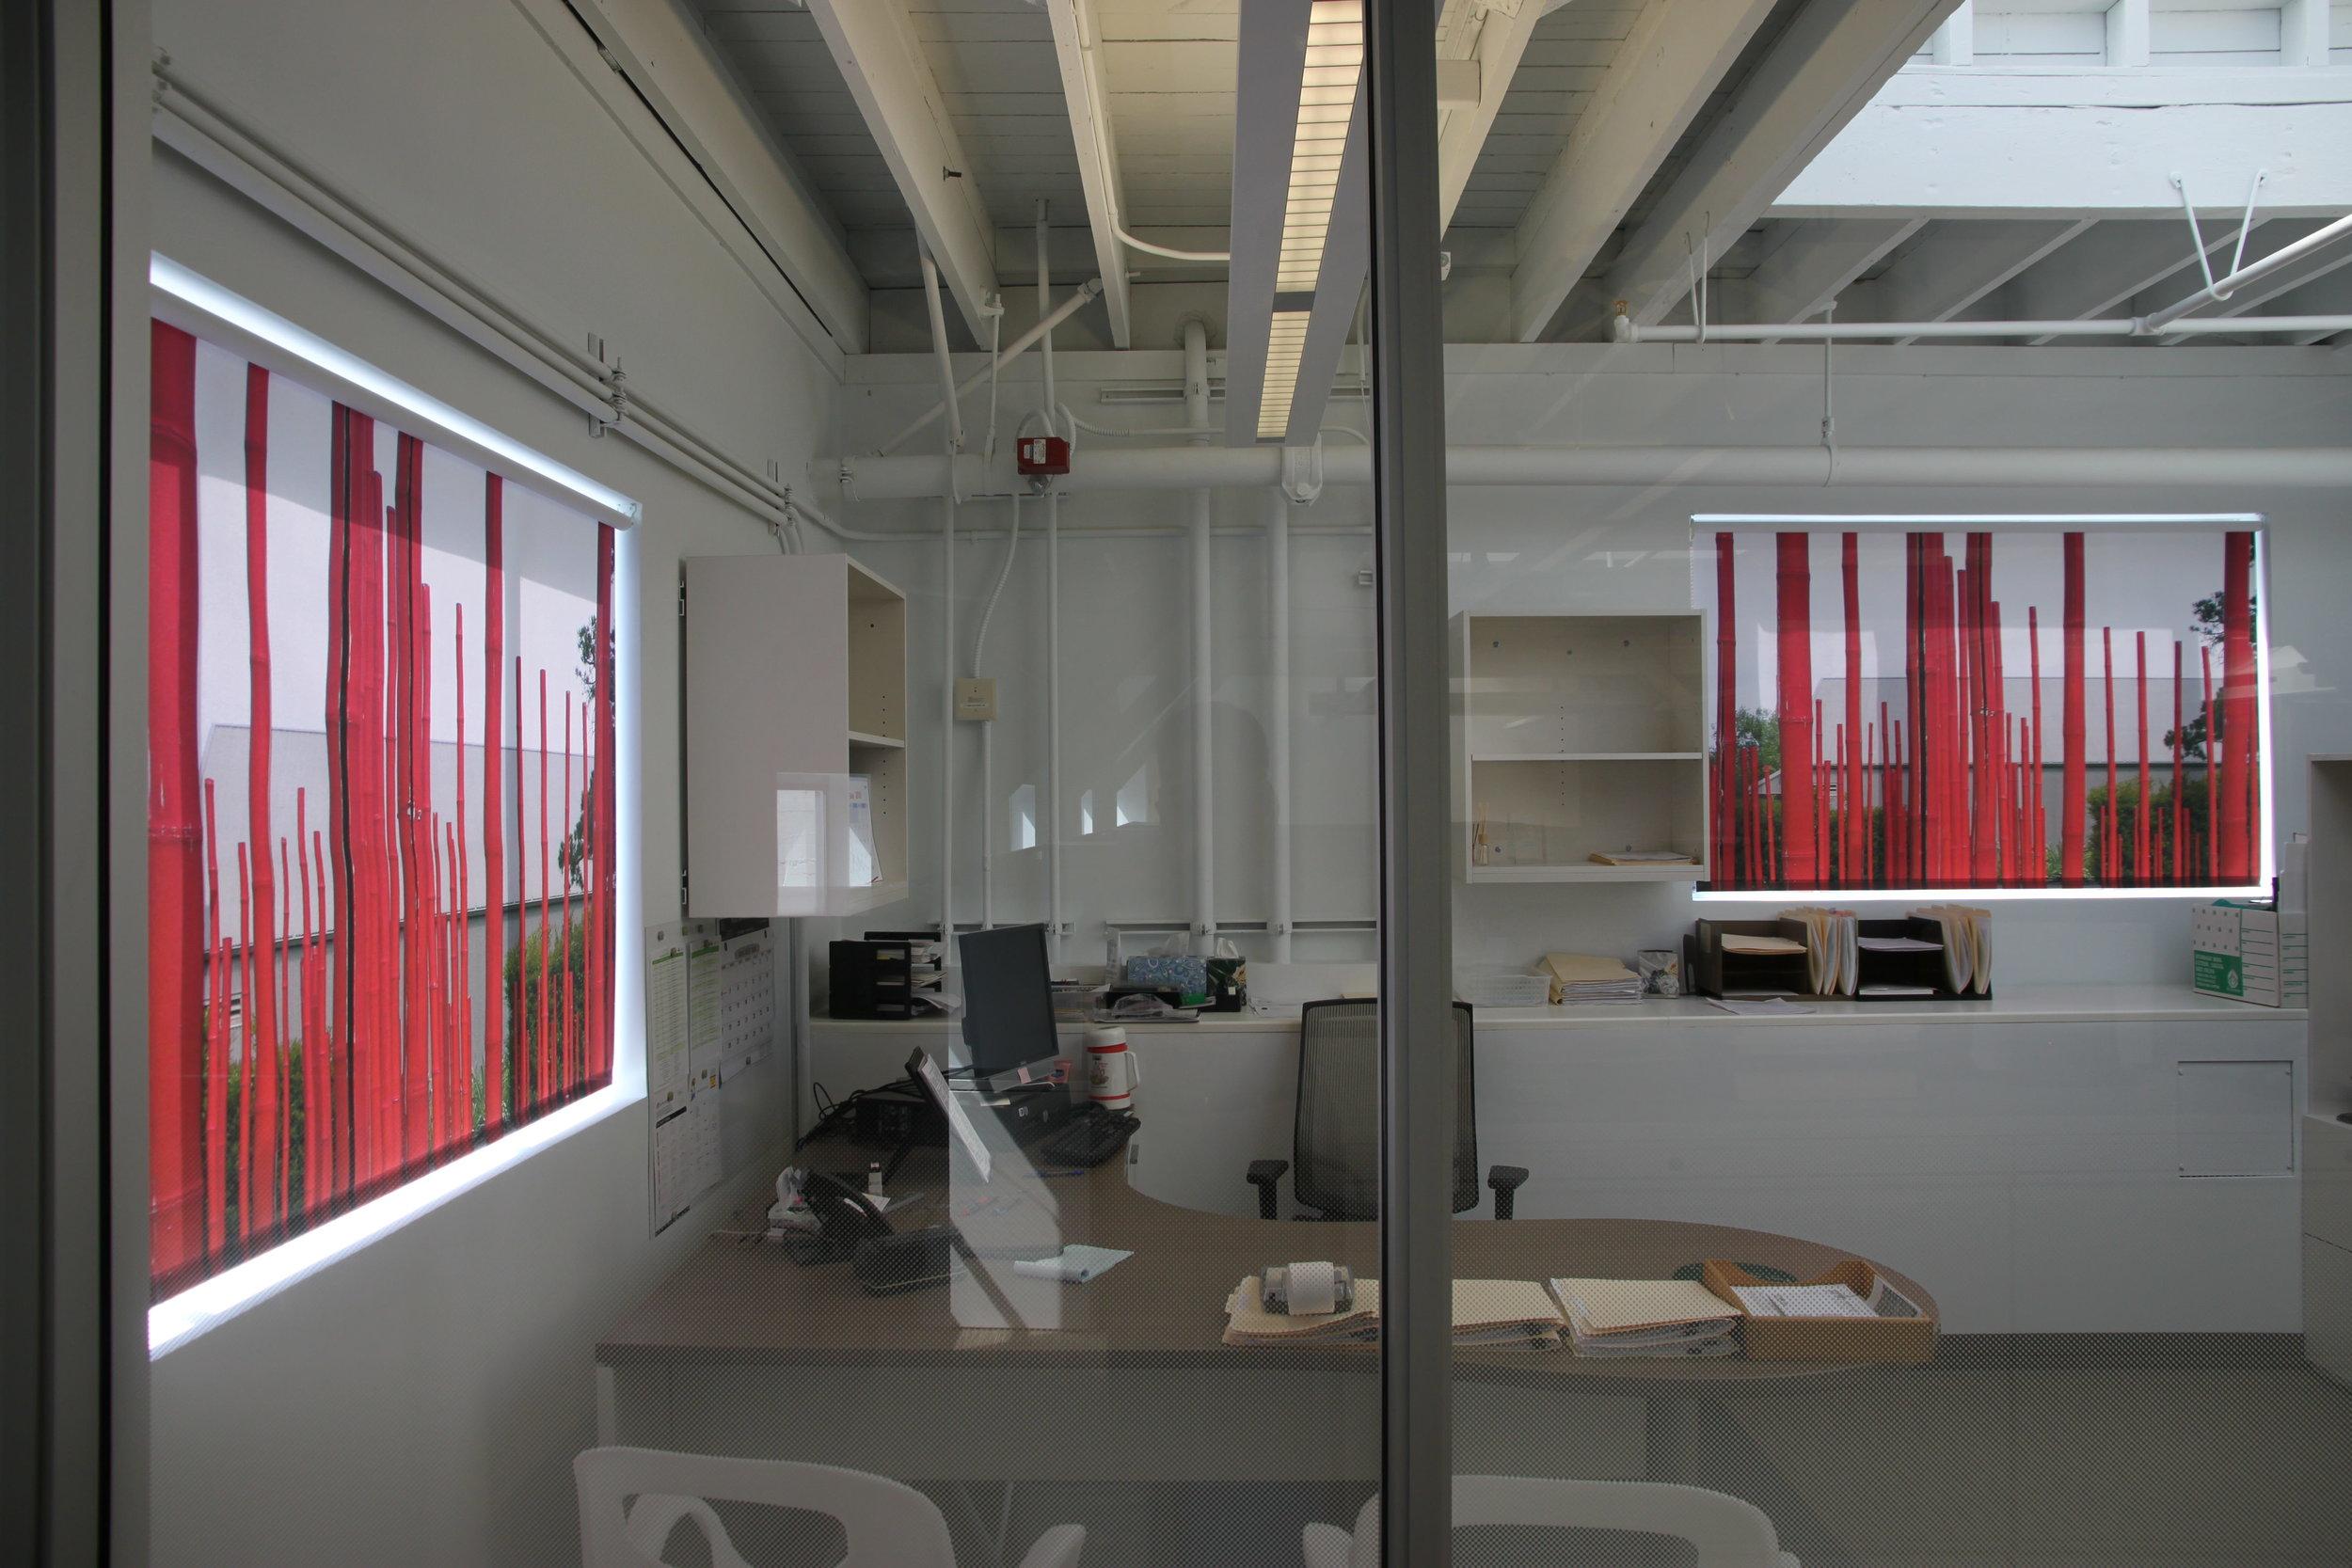 office-custom-printed-roller-blinds-3.jpeg